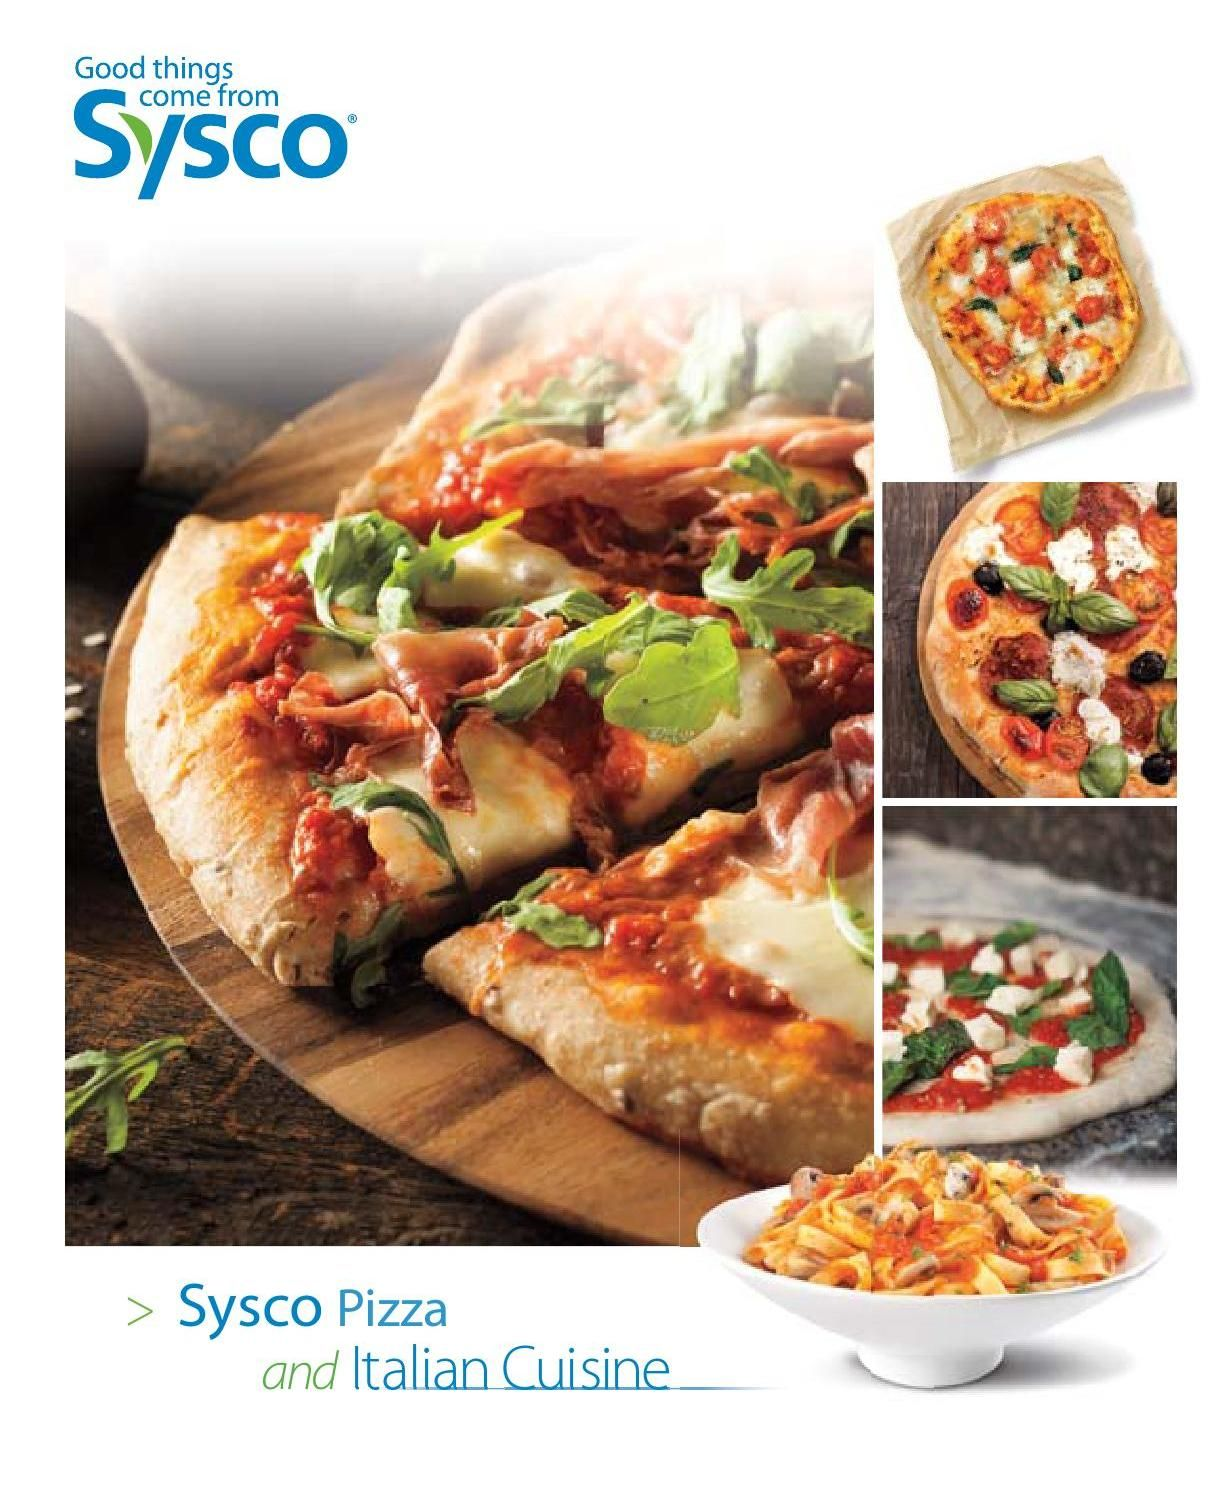 Pizza and italian cuisine Cuisine, Italian cuisine, Pizza